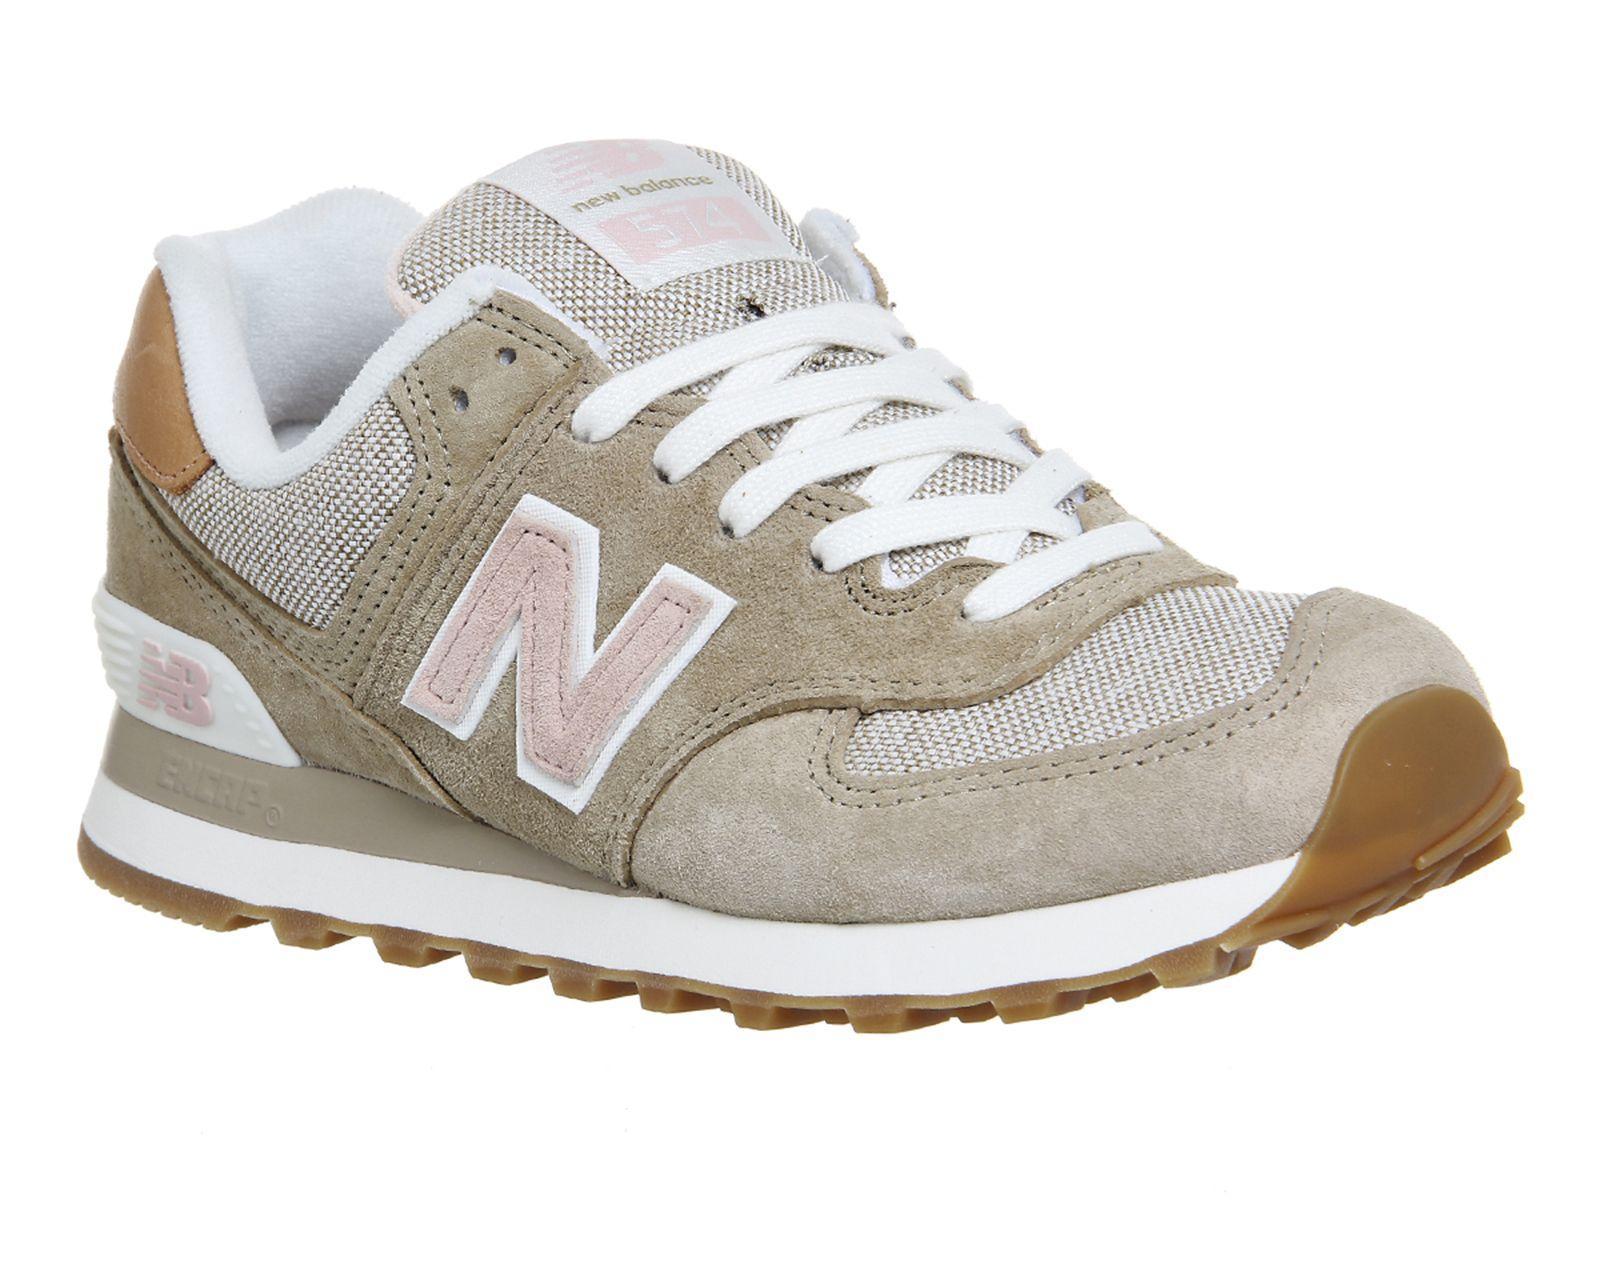 new balance 574 classic beige